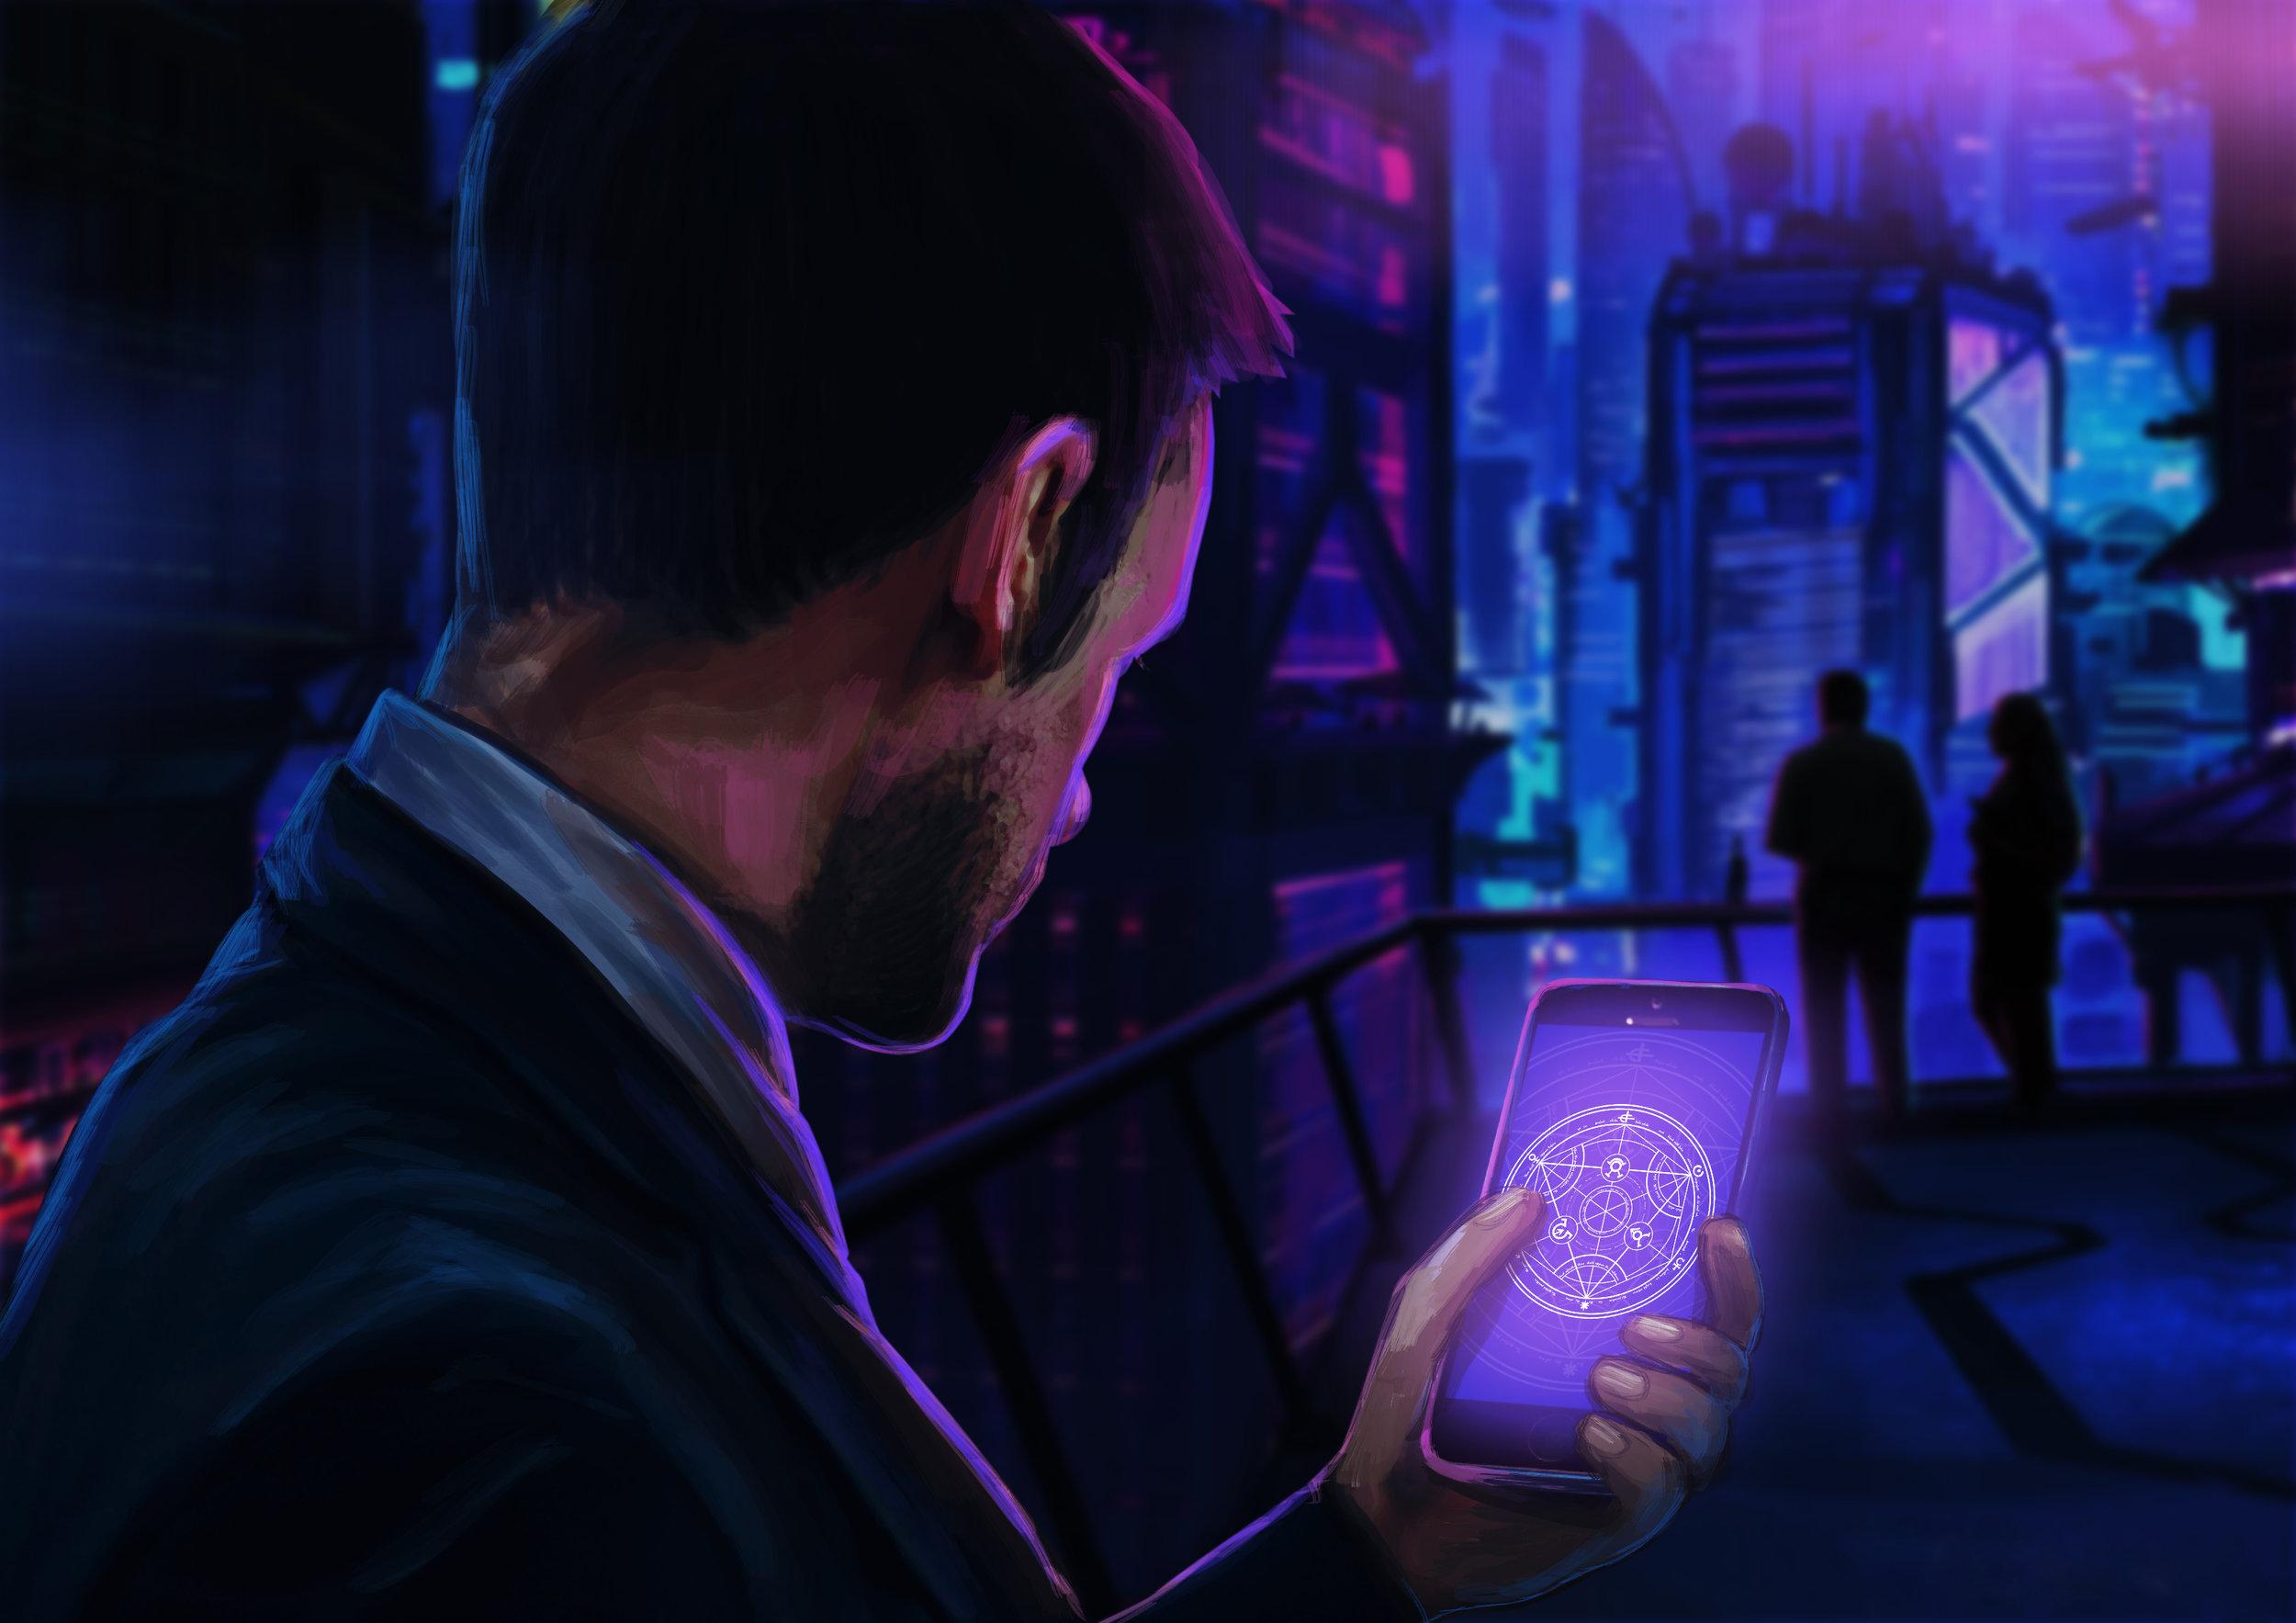 Techlandia - Concept Art